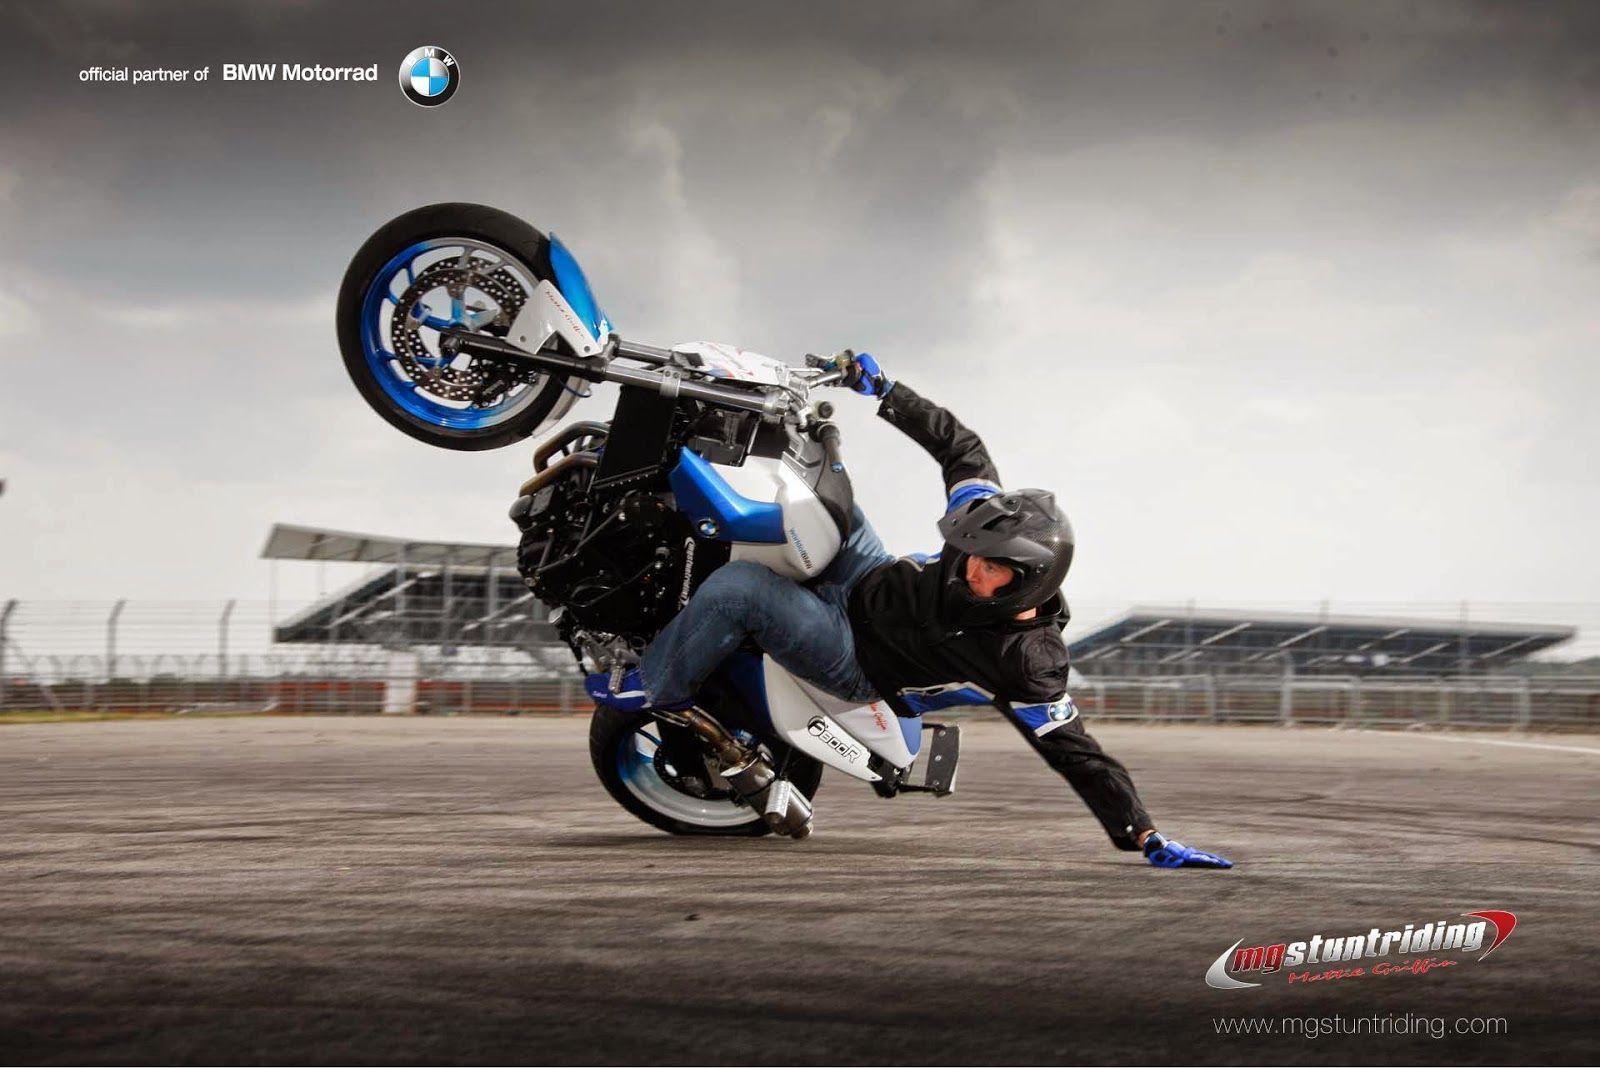 Dangerous Bike Stunt In 2015 HD Wallpapers - Wallpaper Cave